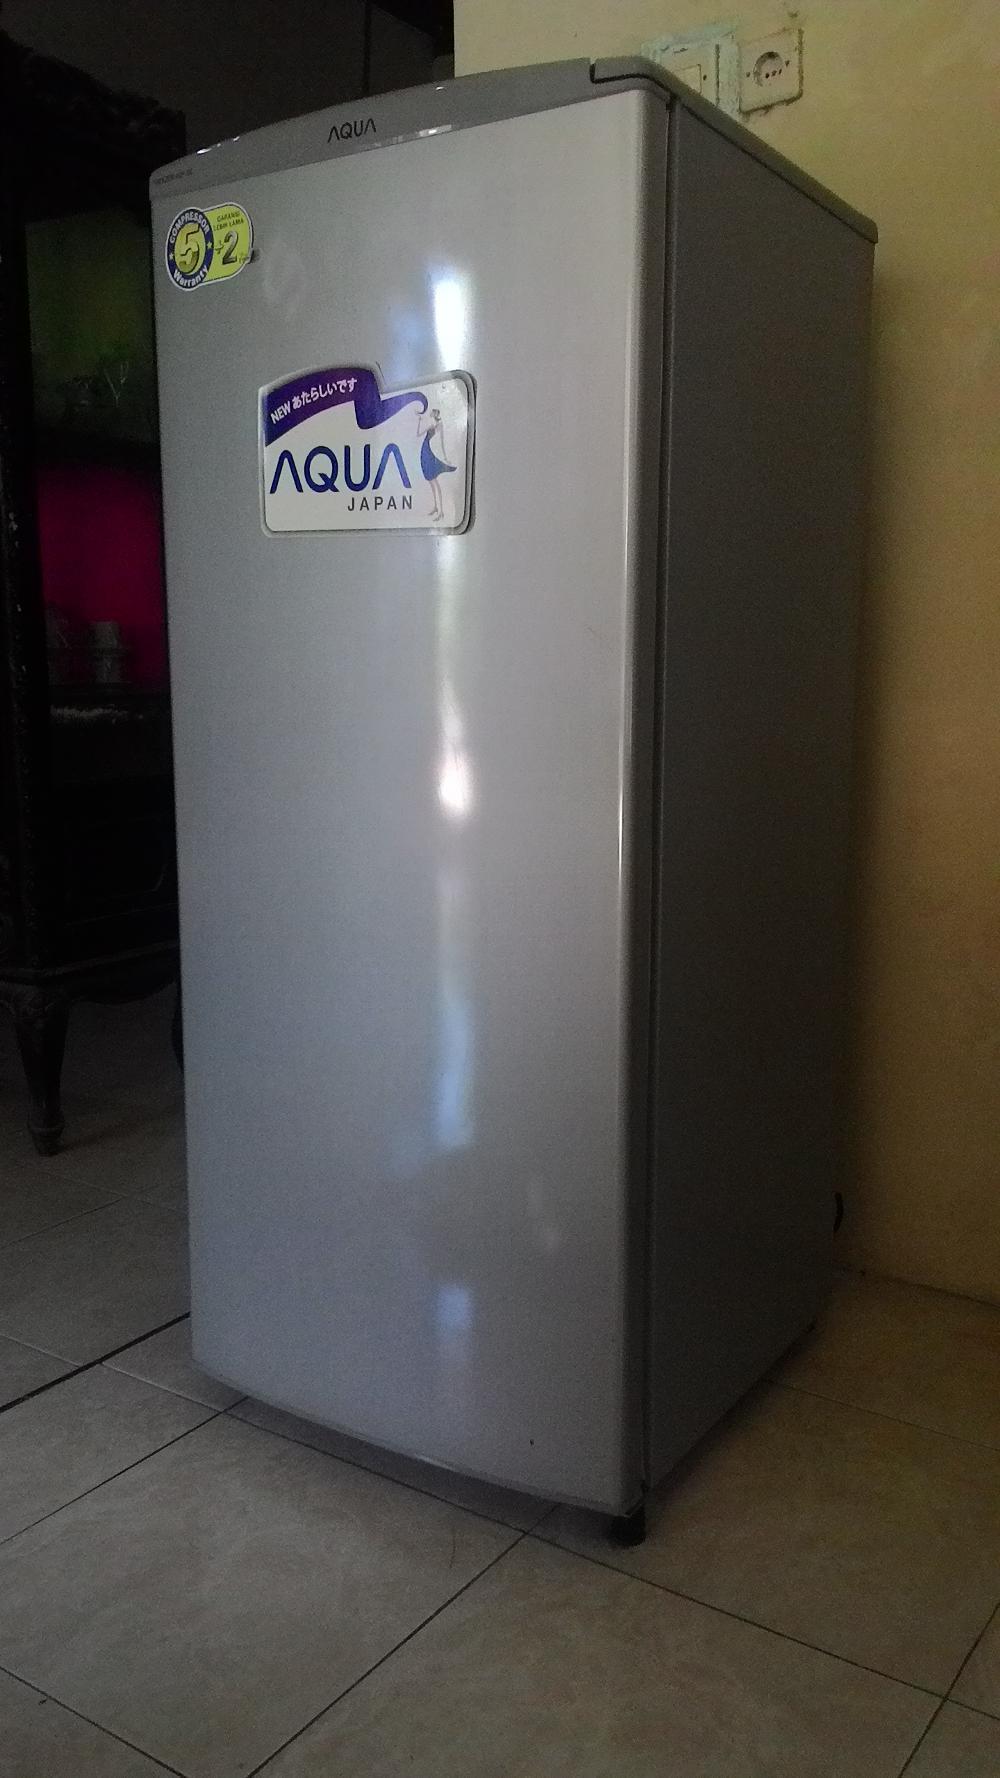 AQUA AQF-S6(S) Kulkas Freezer Asi Berdiri 6 Rak AQF-S6 ...